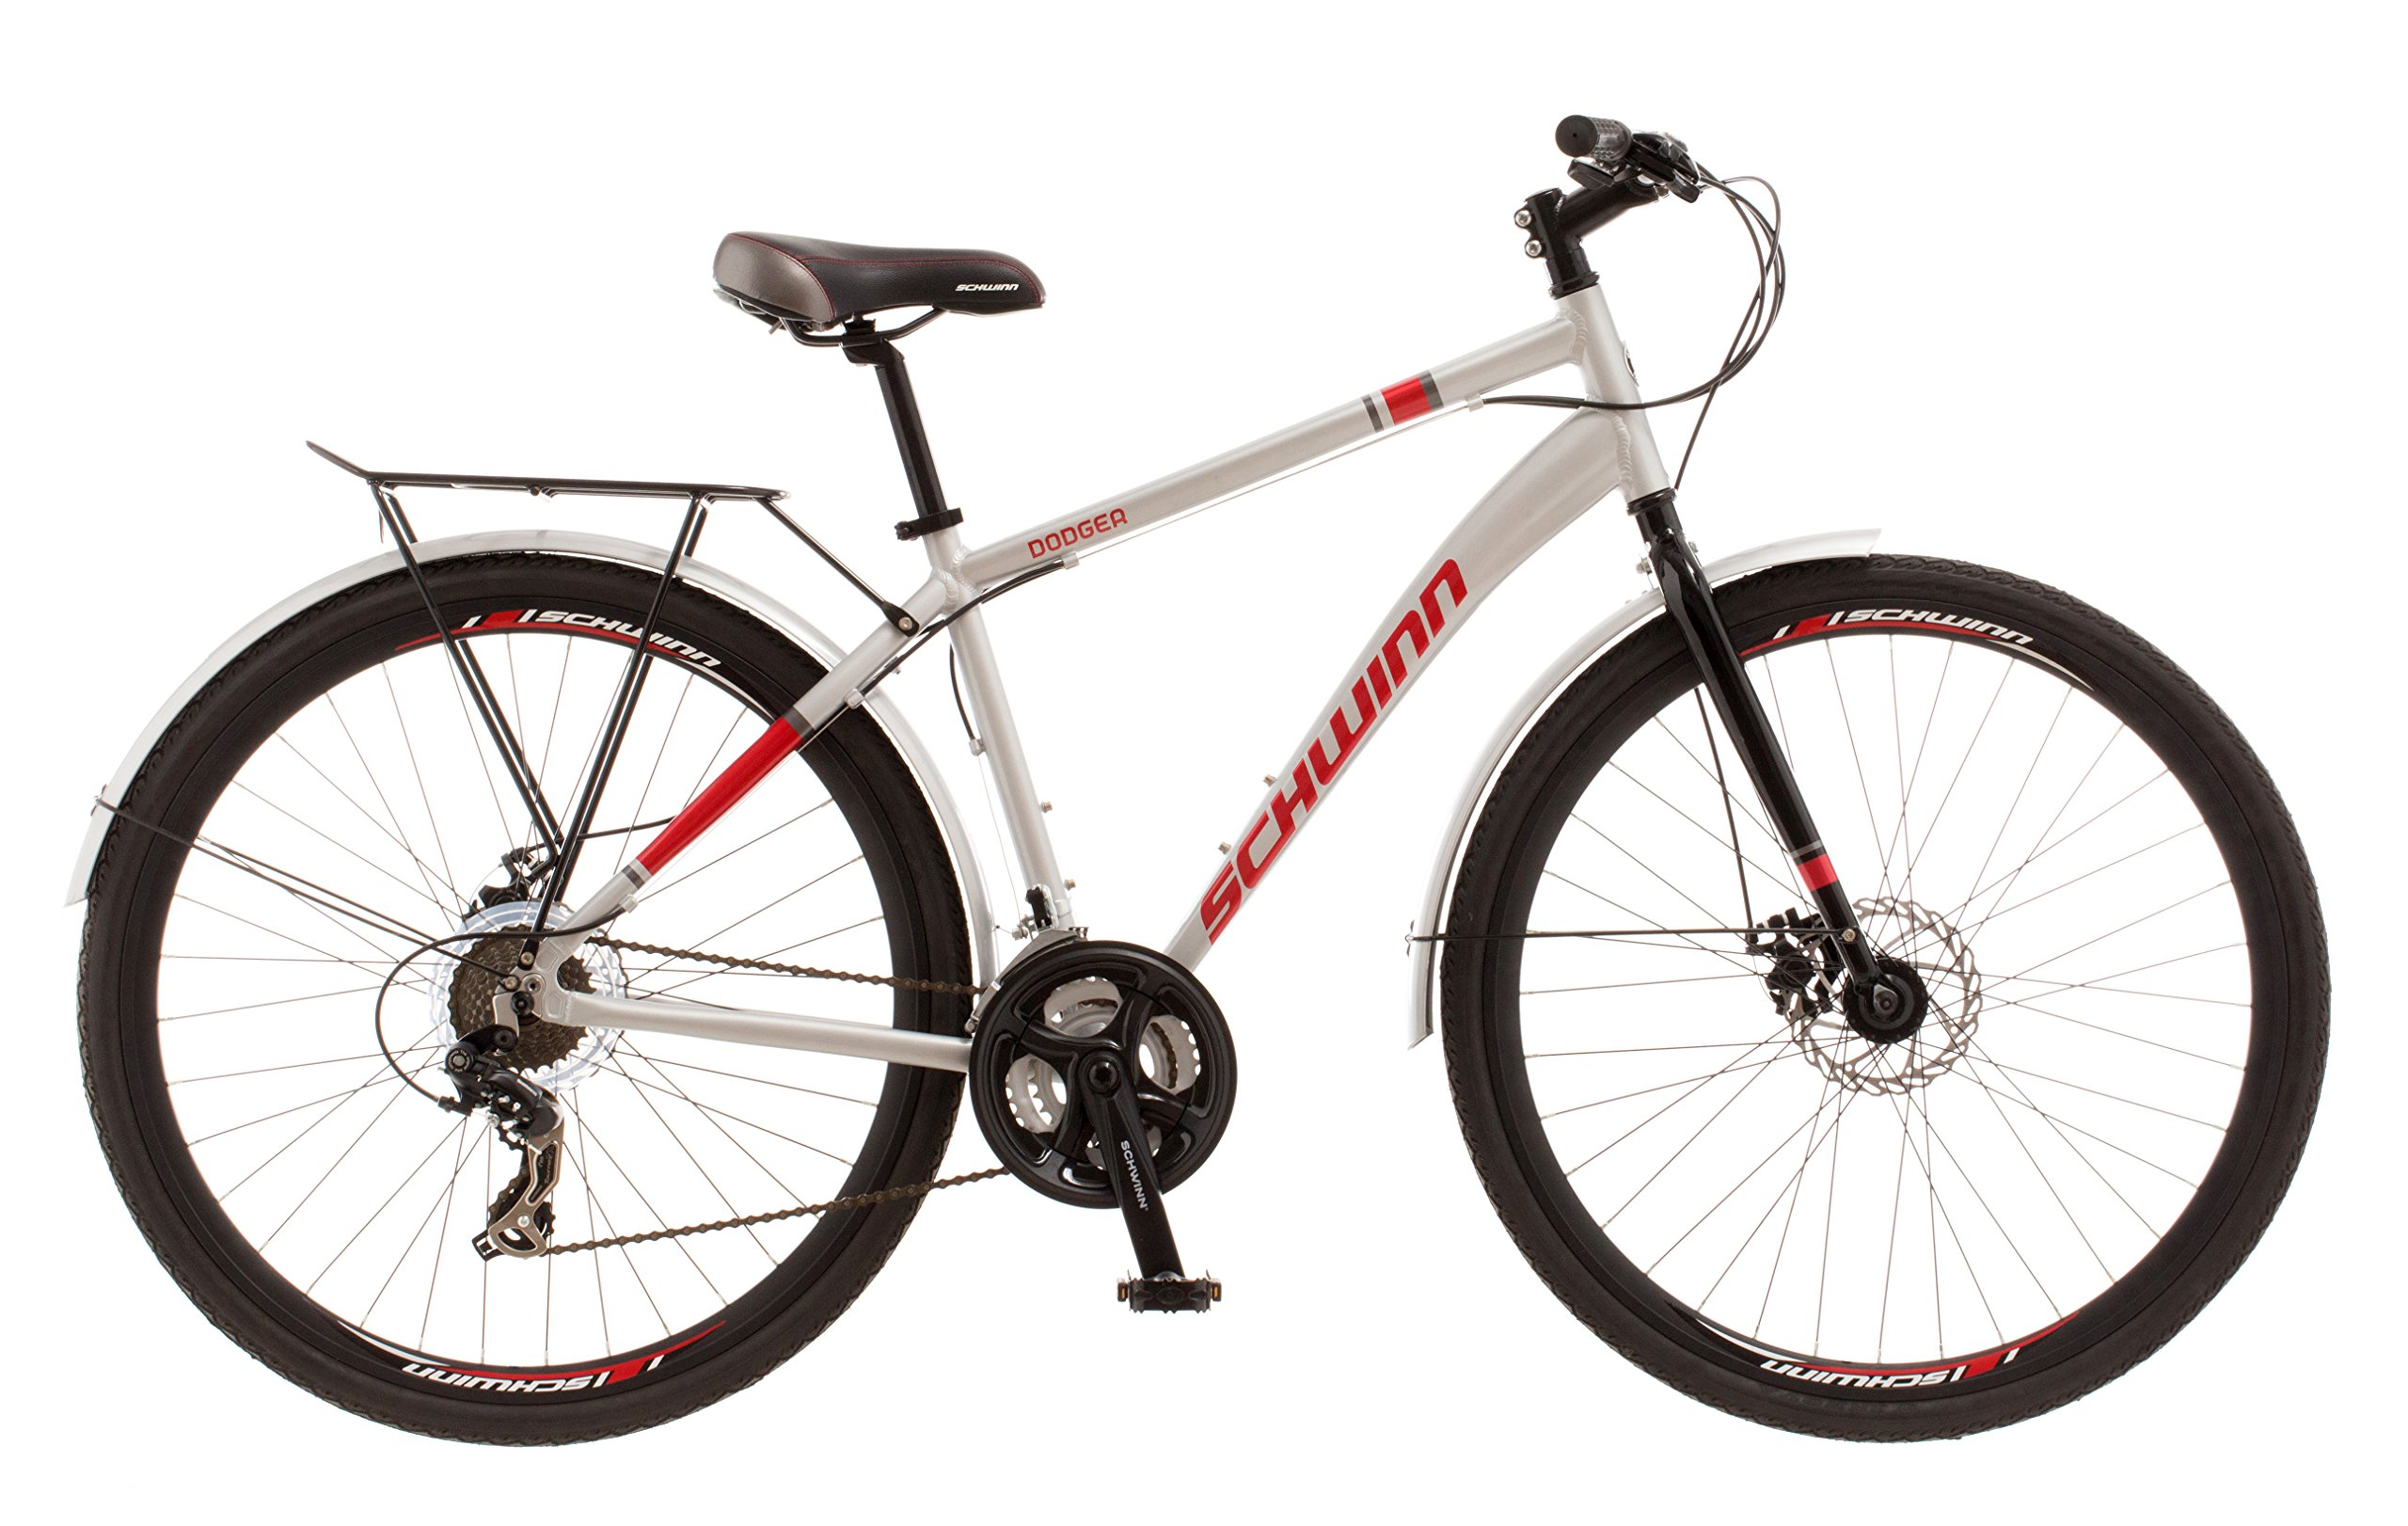 0a9ab5aa882 Get Quotations · Schwinn Dodger Urban 700C Wheel Urban Bicycle, Silver, 18